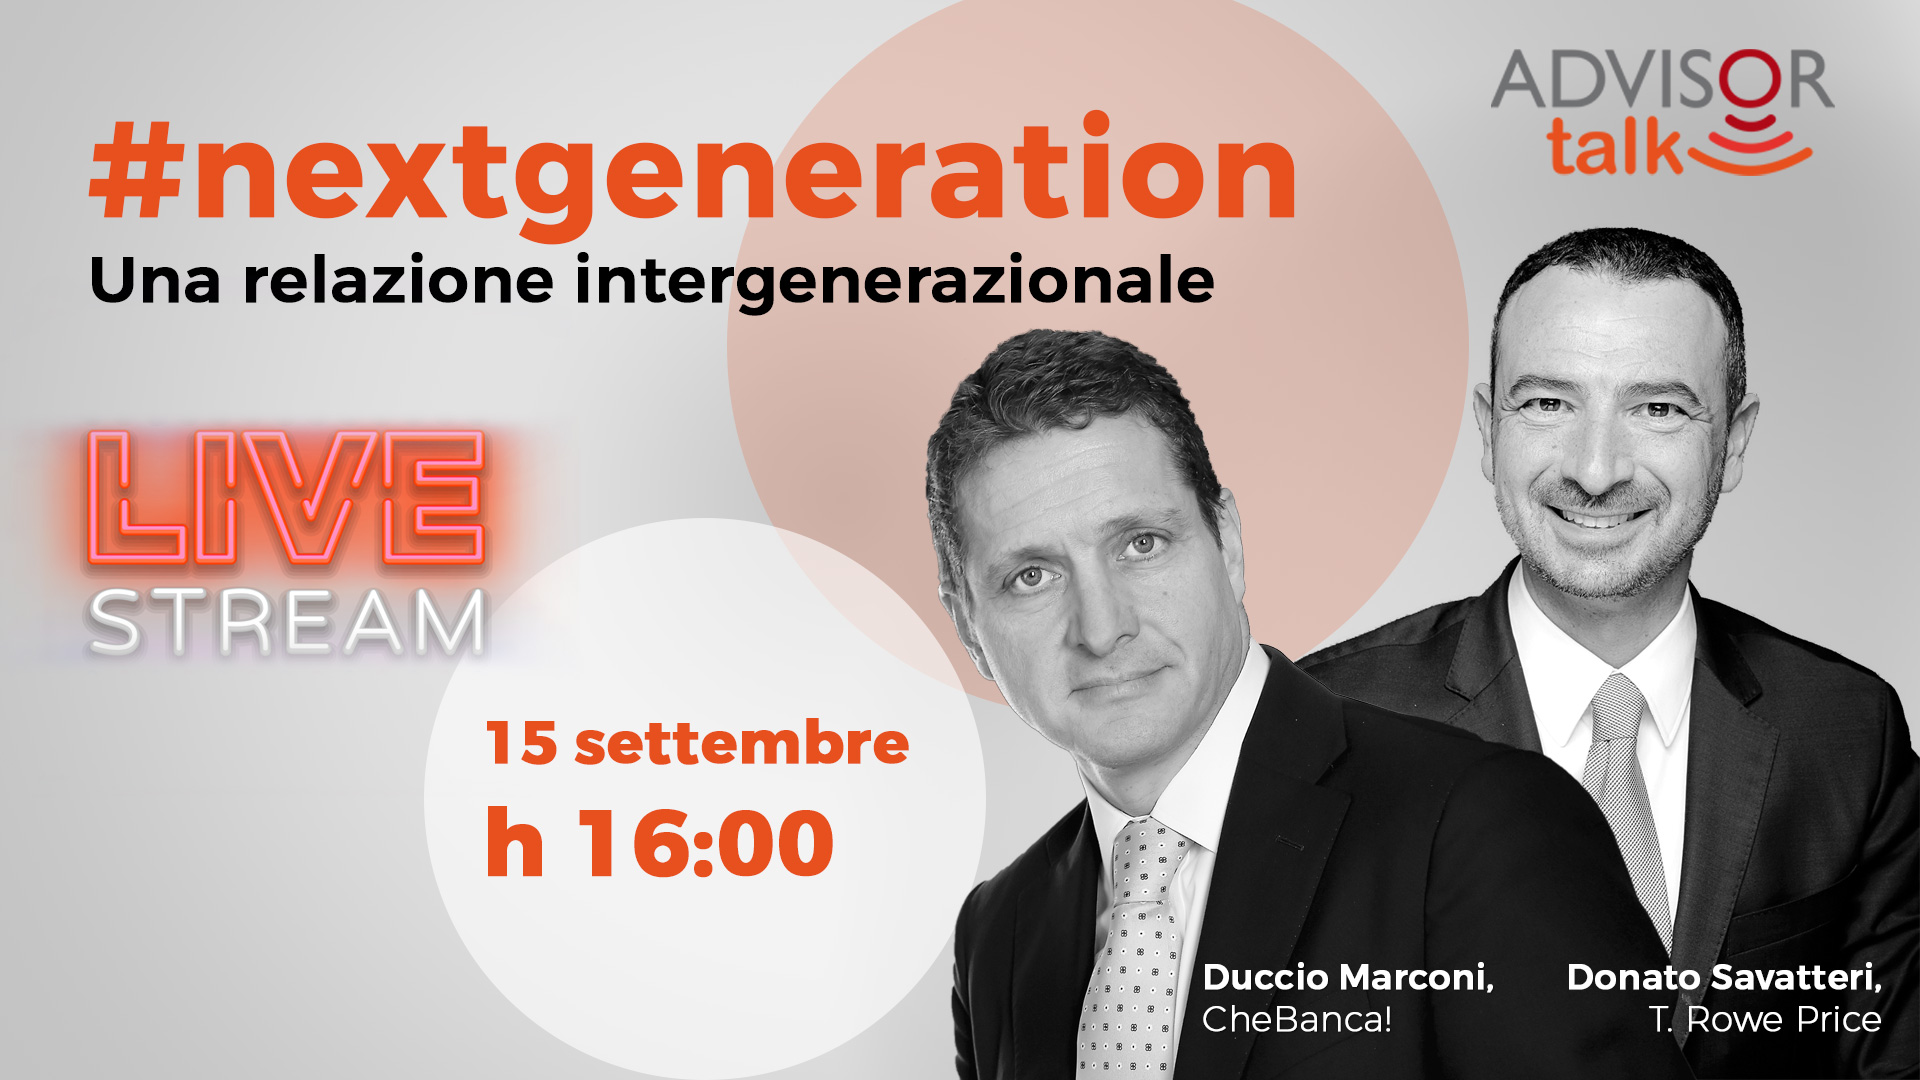 #nextgeneration - Una relazione intergenerazionale